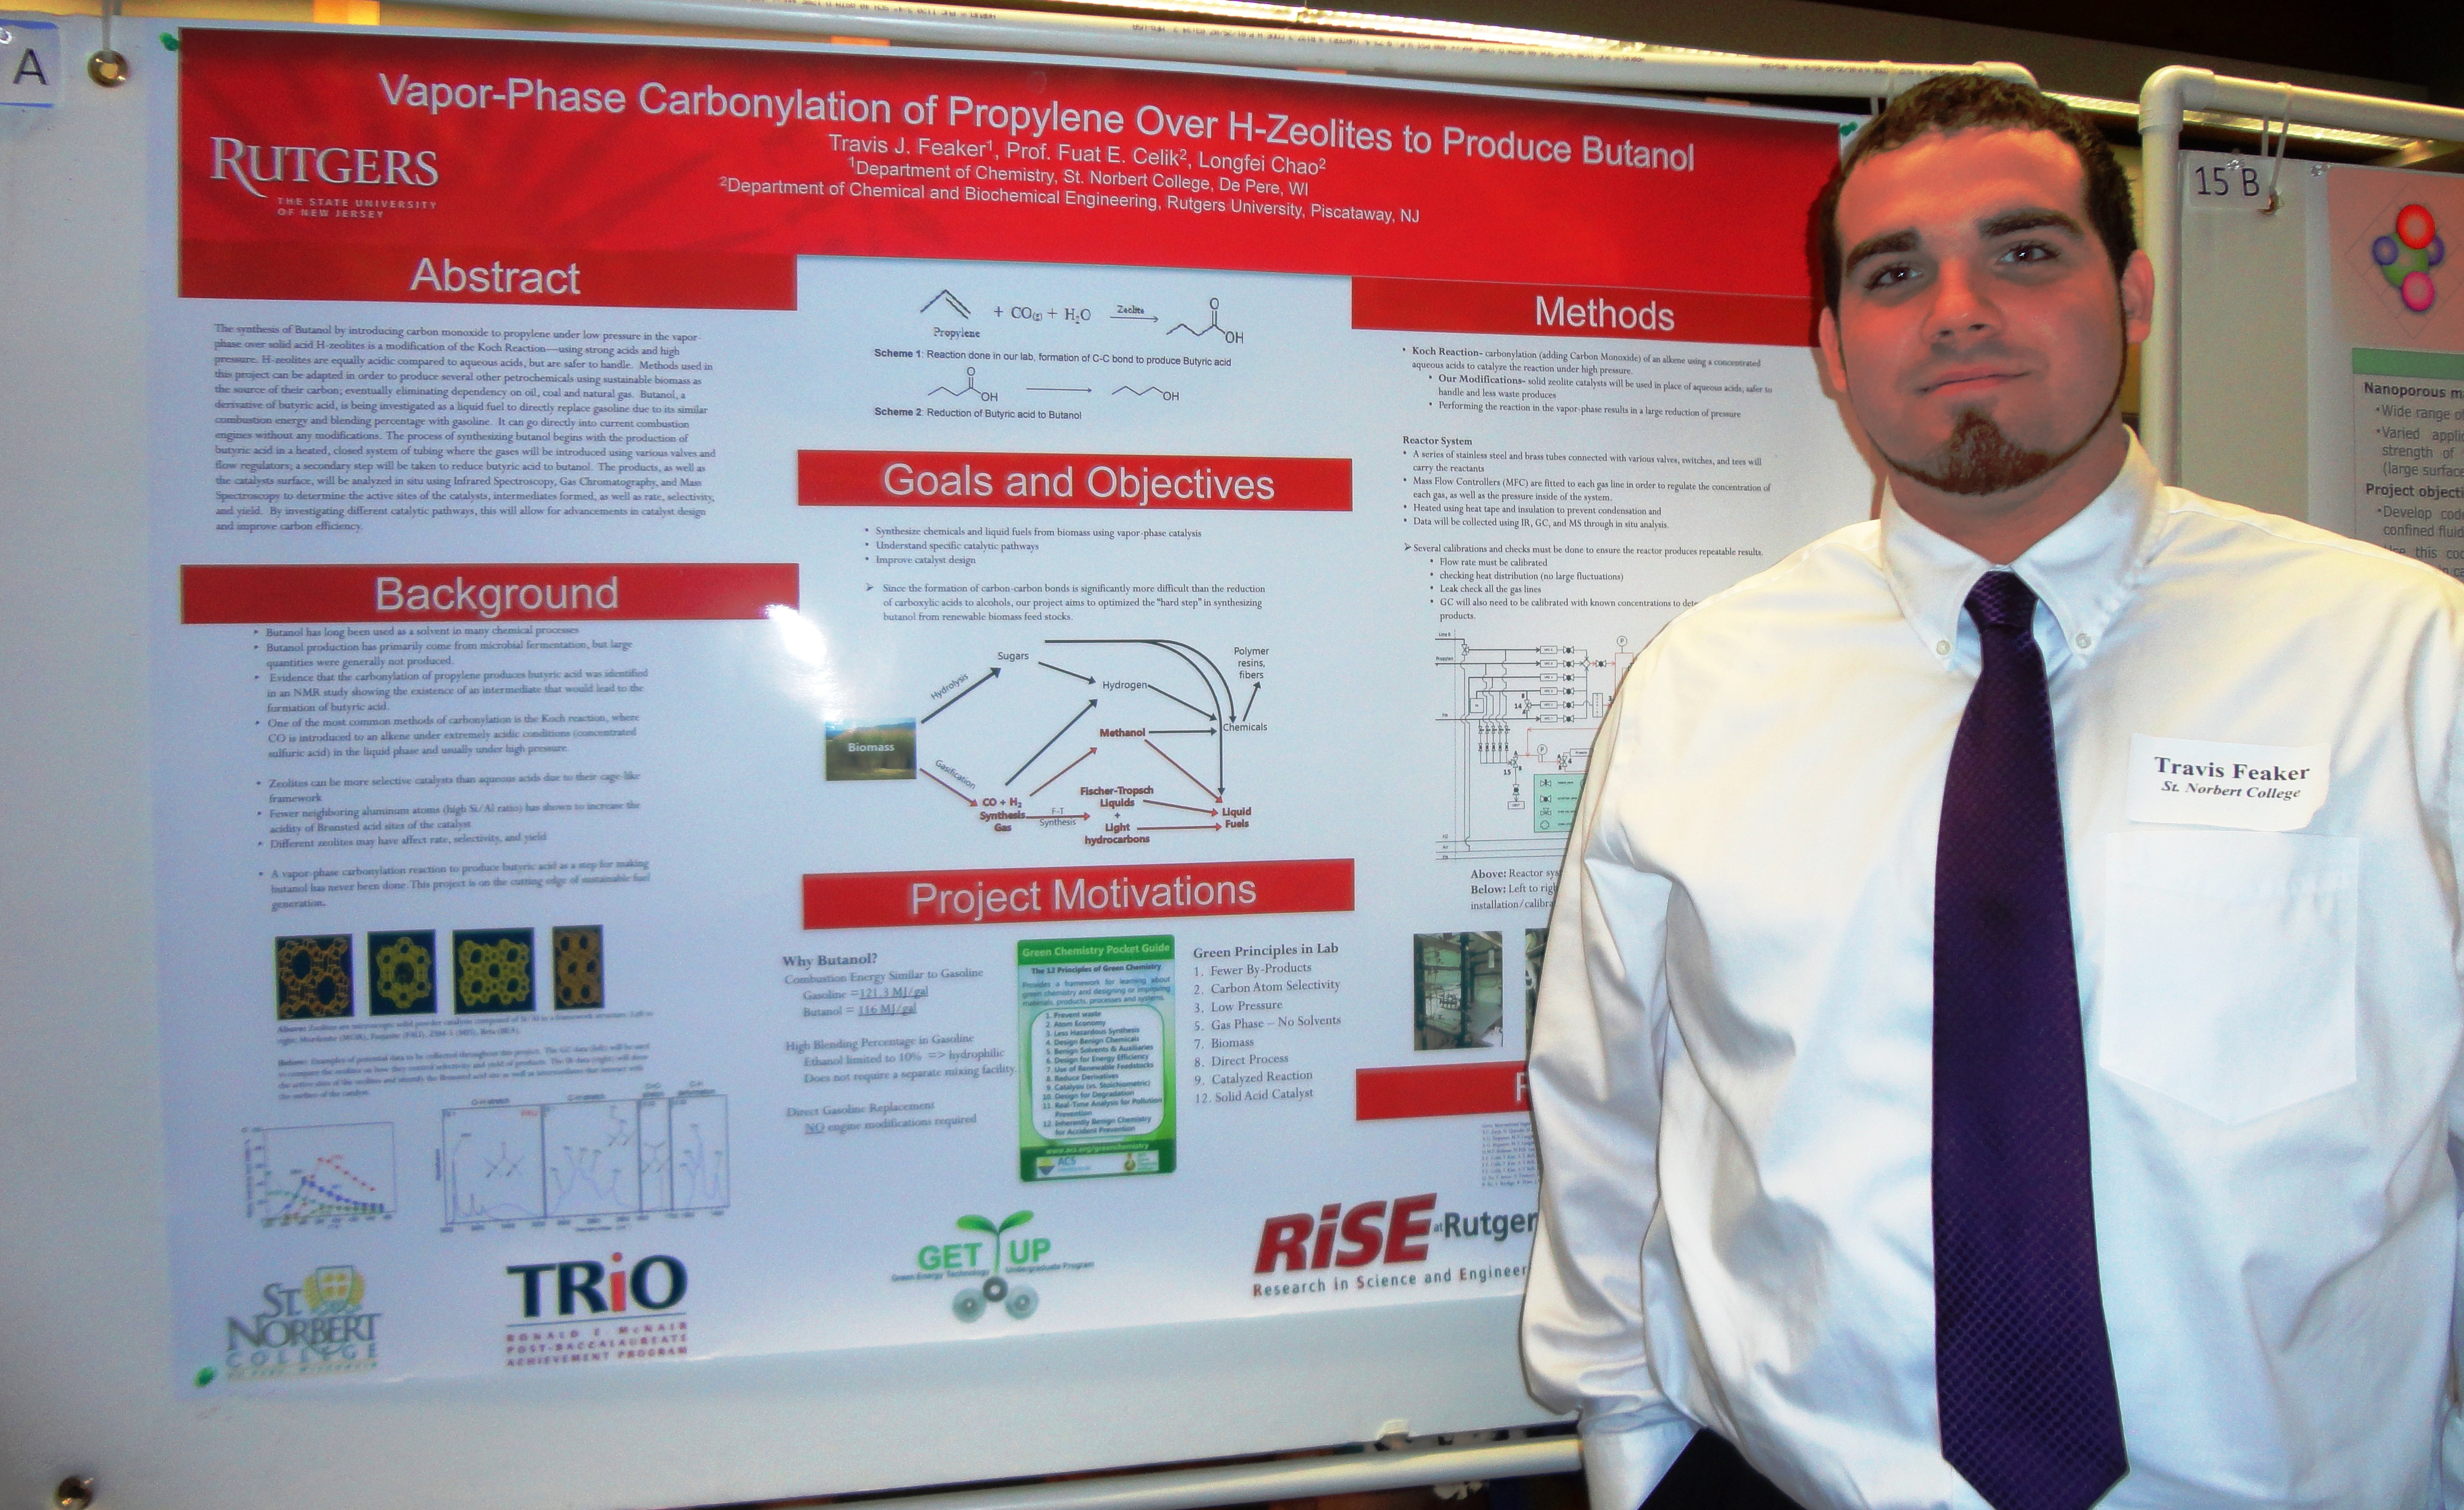 Travis Feaker - Final Poster Symposium.jpg